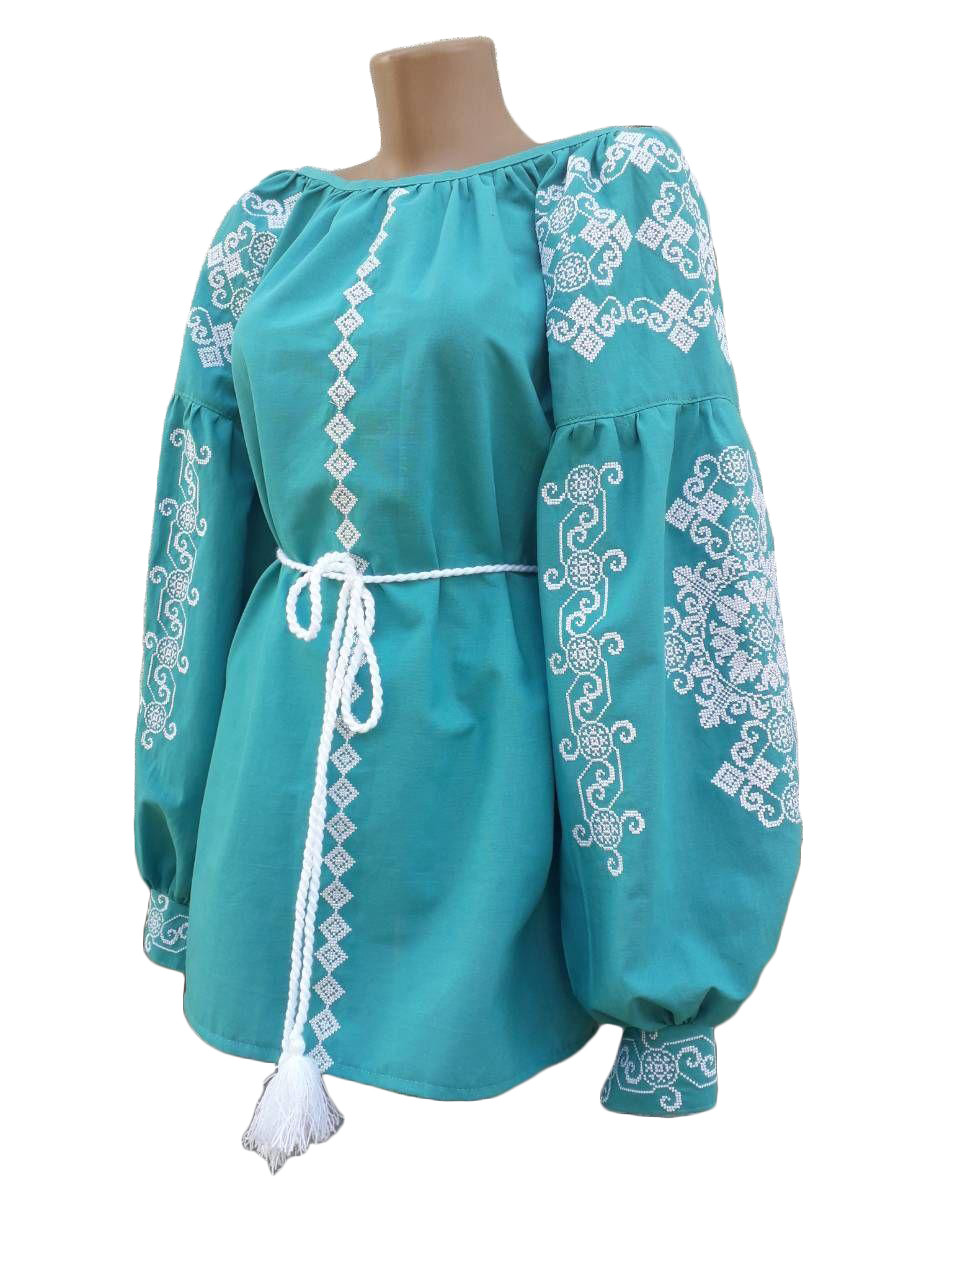 "Жіноча вишита сорочка (блузка) ""Наомі"" (Женская вышитая рубашка (блузка) ""Наоми"") BN-0029"